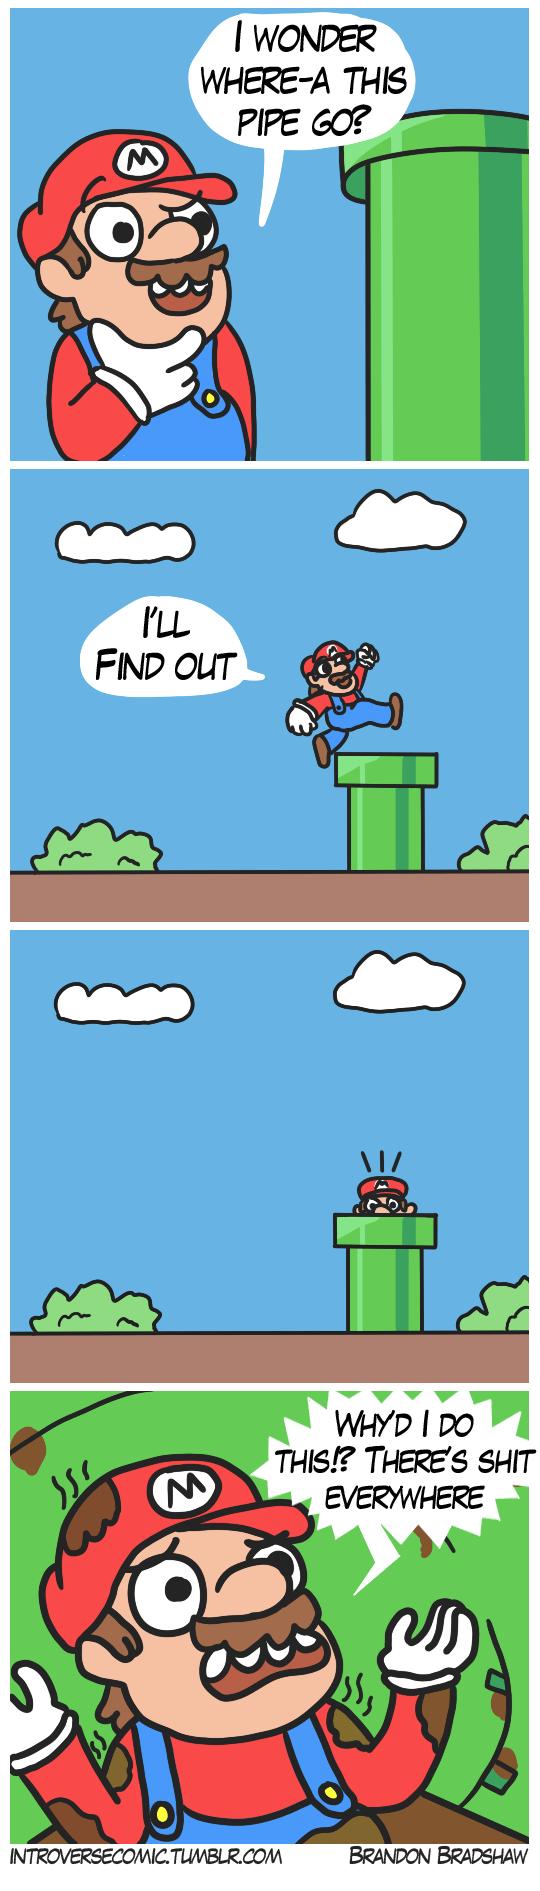 video-game-logic-mario-bros-moment-nintendo